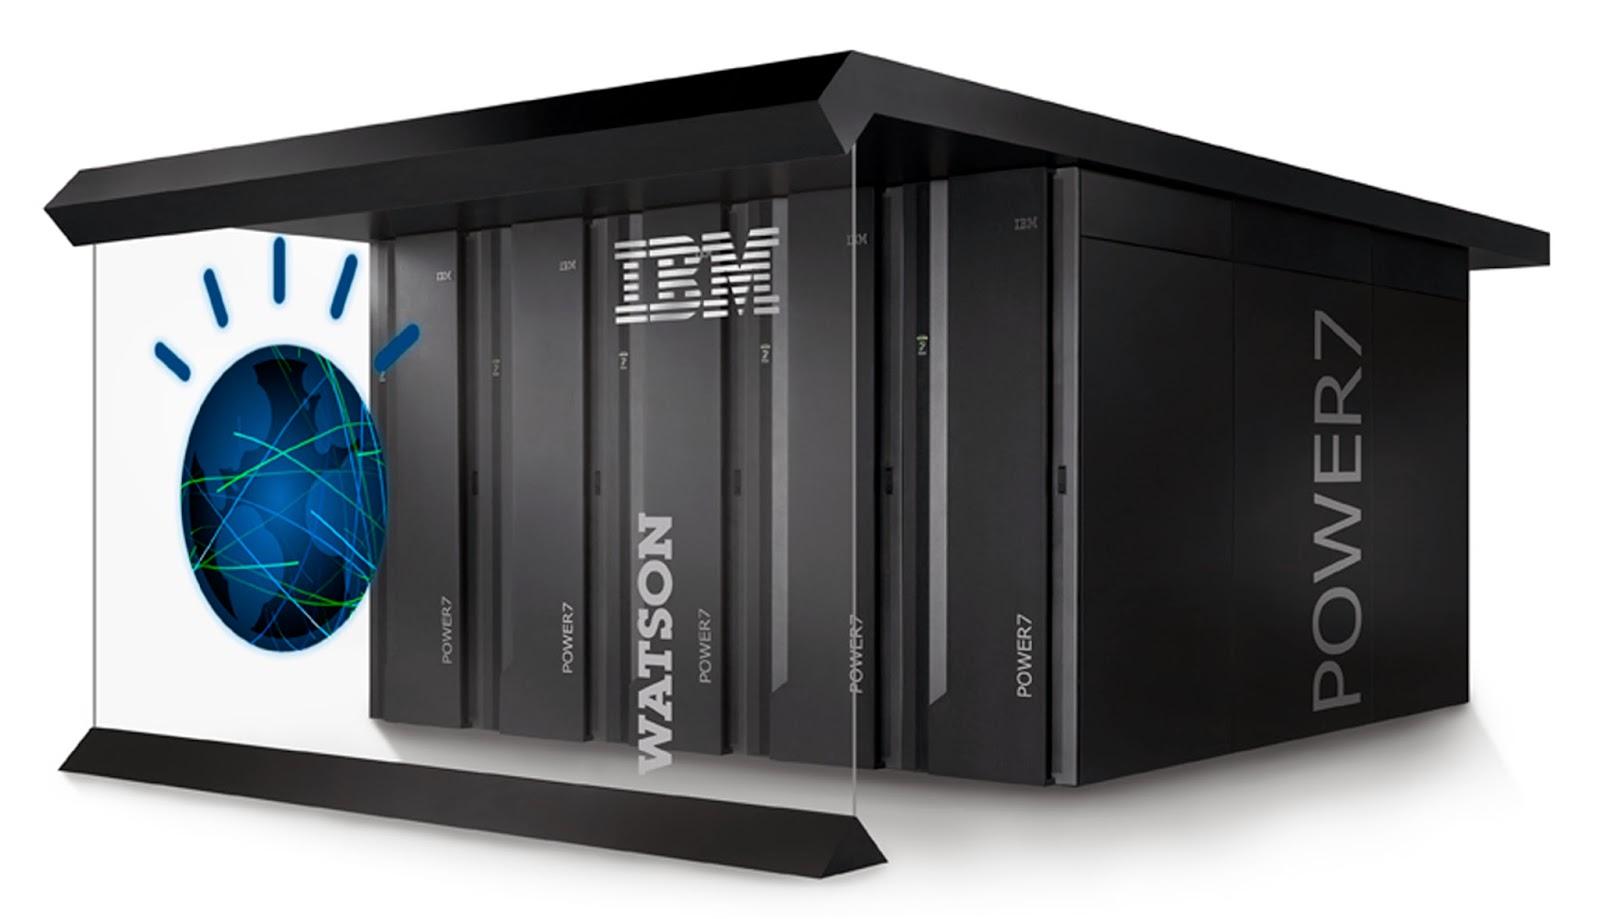 IBMのWatson